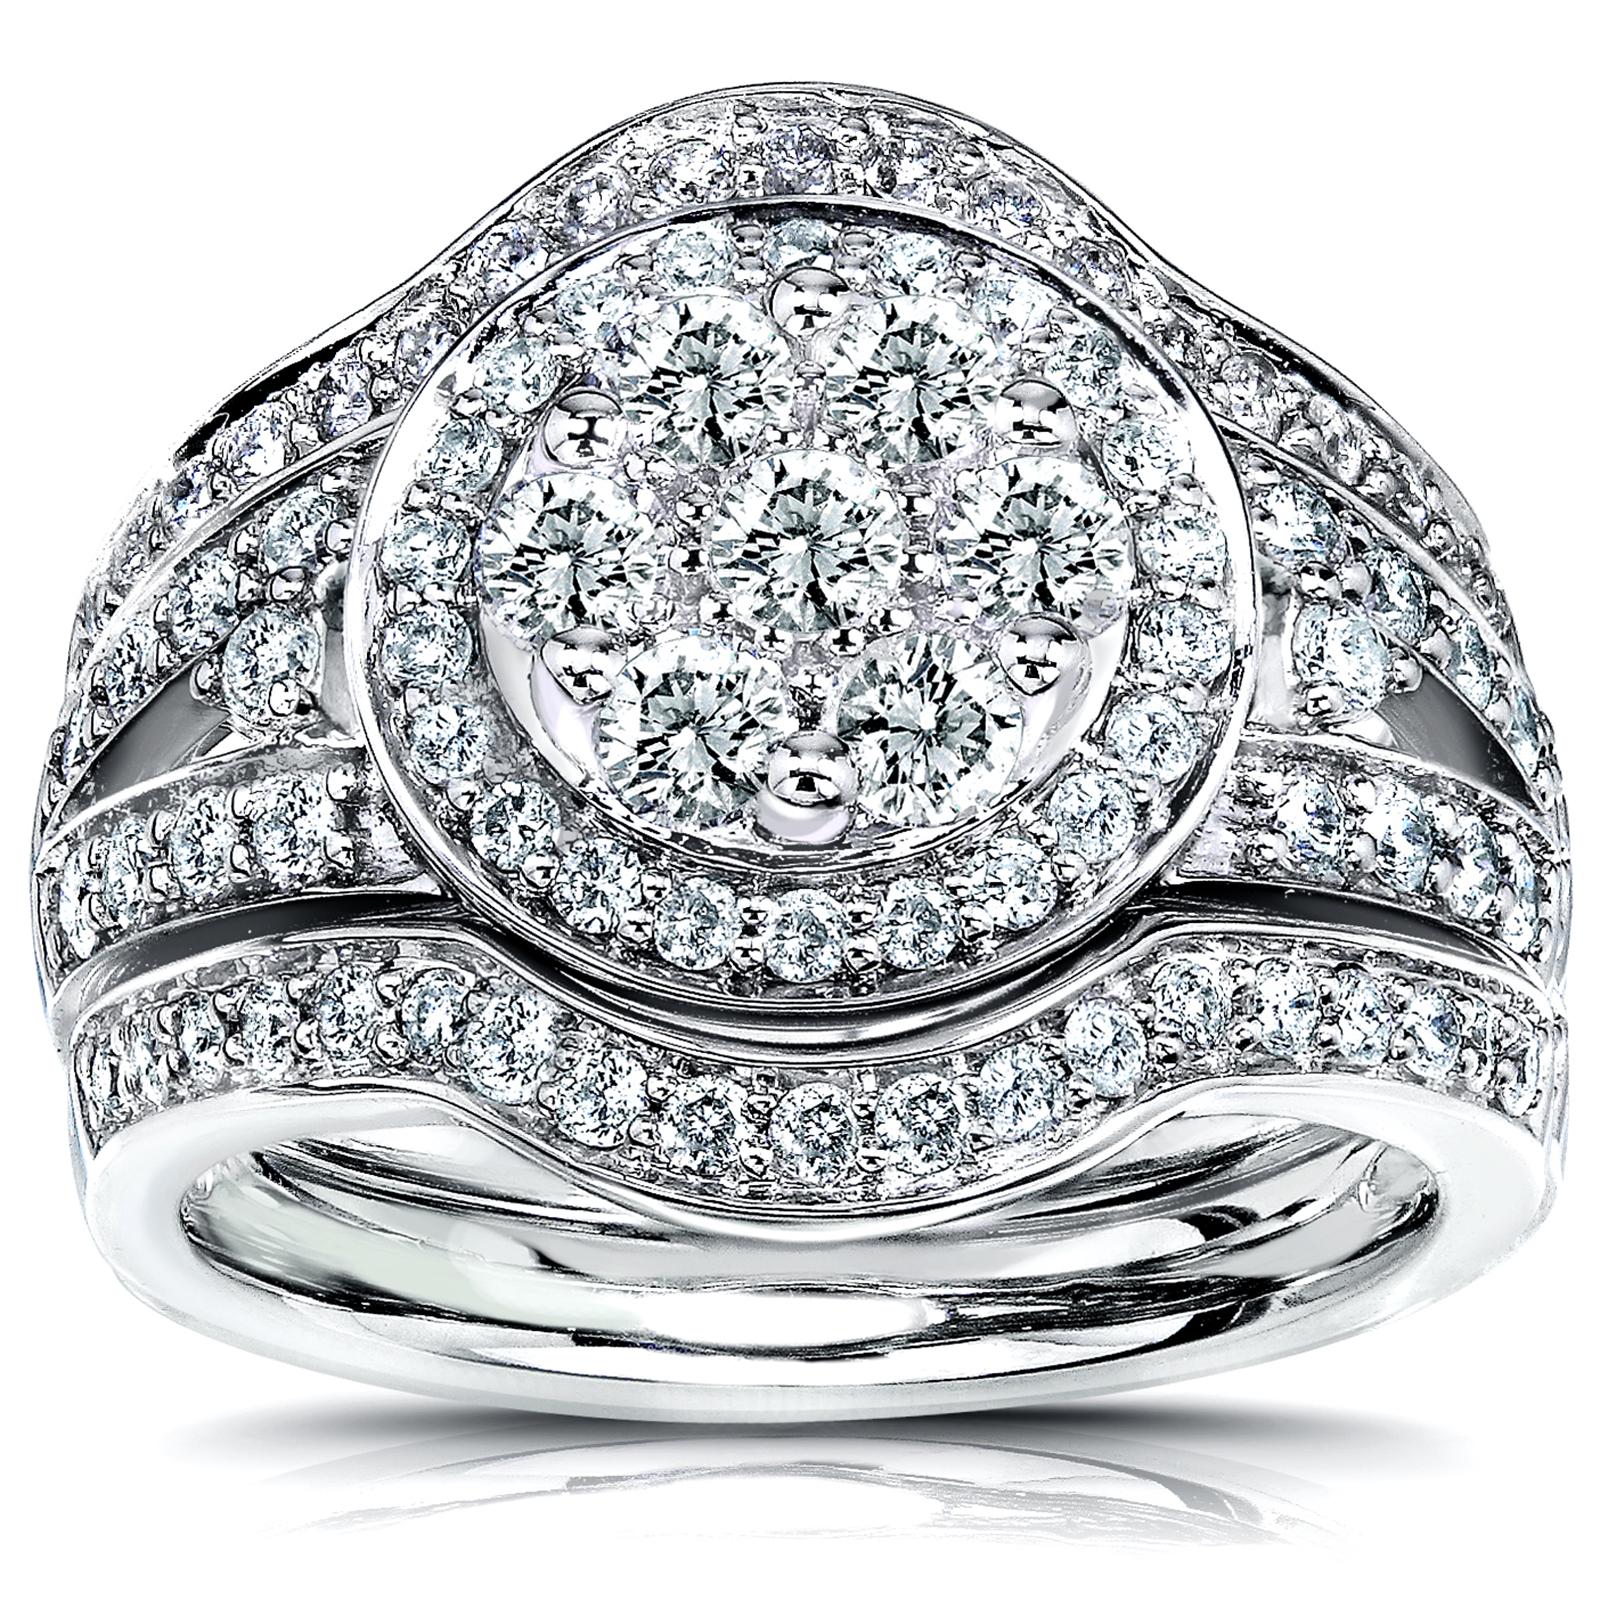 Kobelli 1 1/5 Carat (ct.tw) Round Diamond Halo Cluster 3-Piece Bridal Rings Set in 14K White Gold PartNumber: 3ZZVA96857912P MfgPartNumber: 61153WS-2B